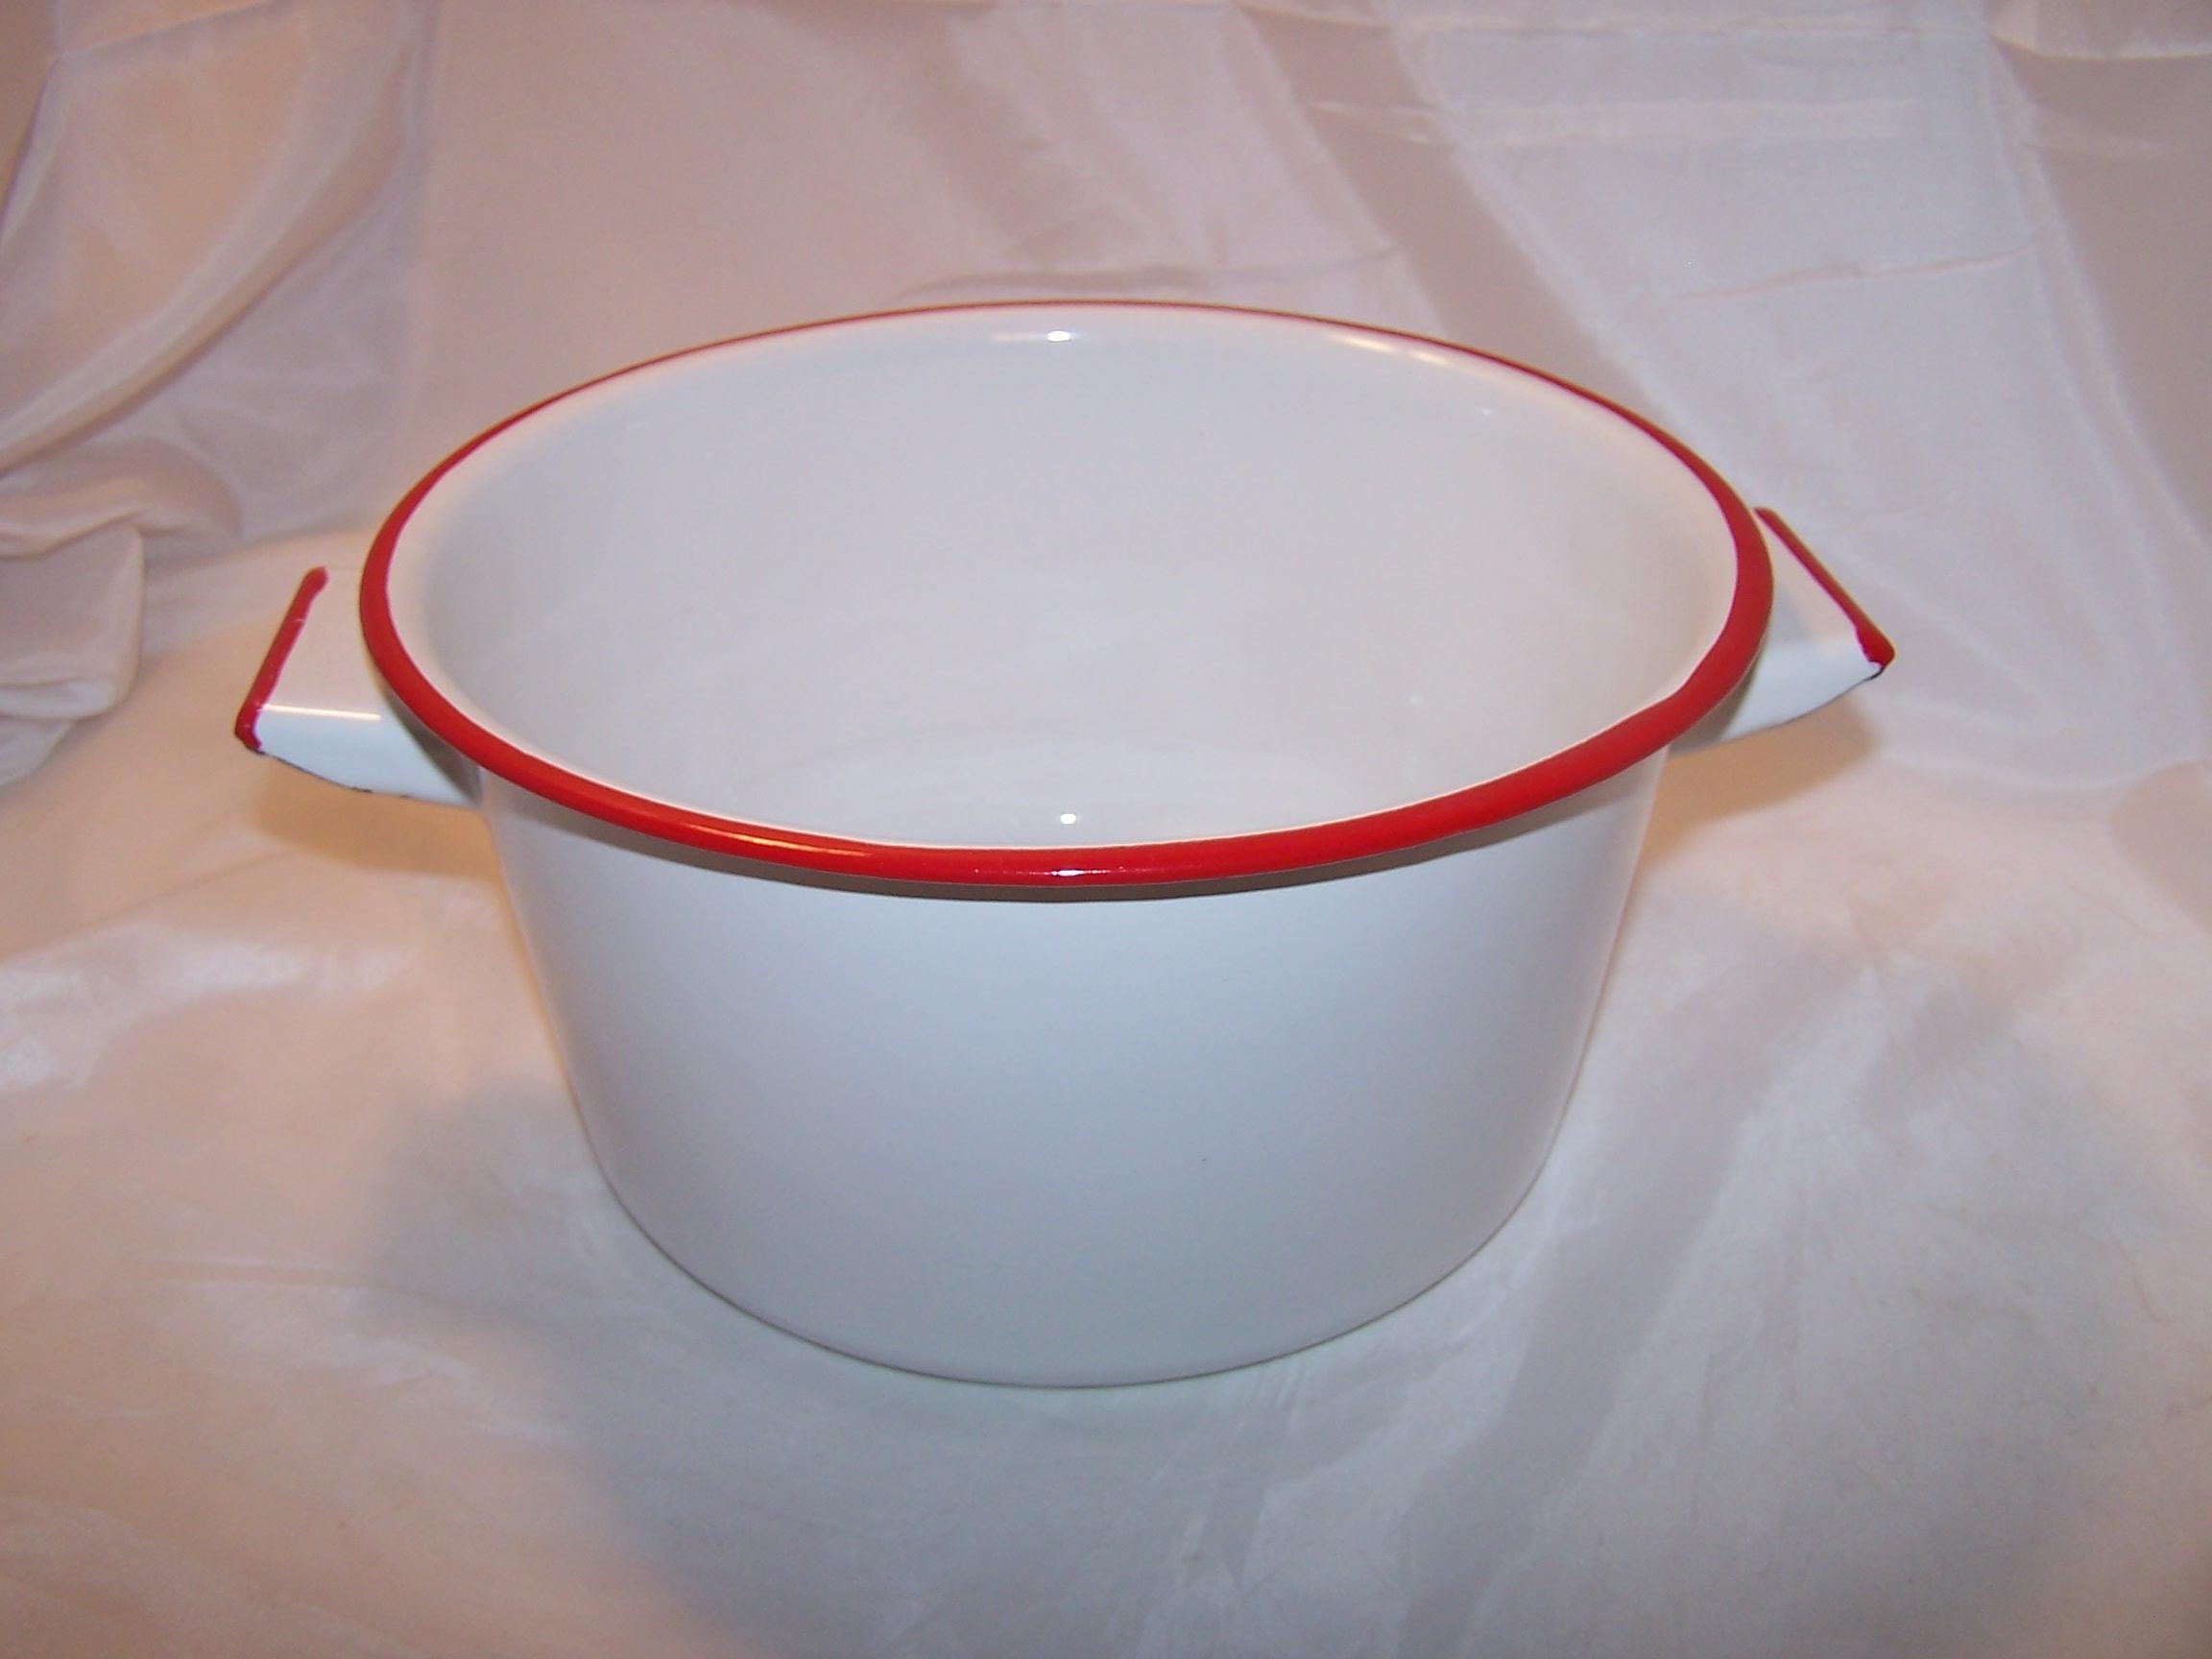 Enamelware Enamel Clad Cooking Pot Red White Vintage